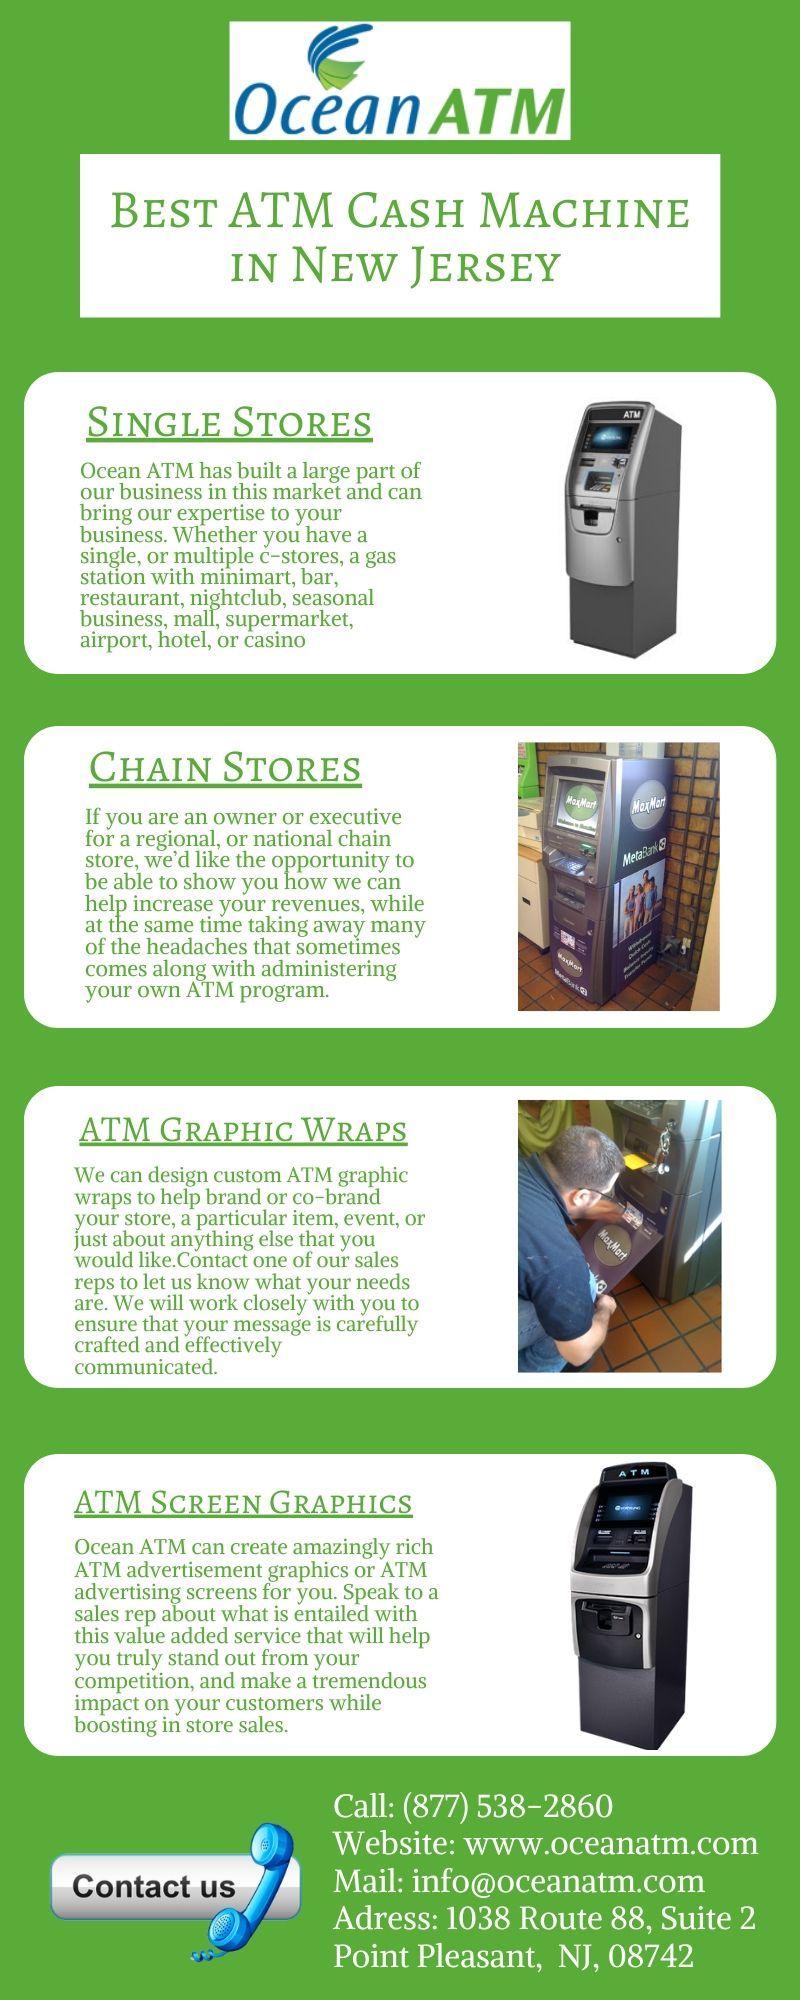 How do you buy an atm machine